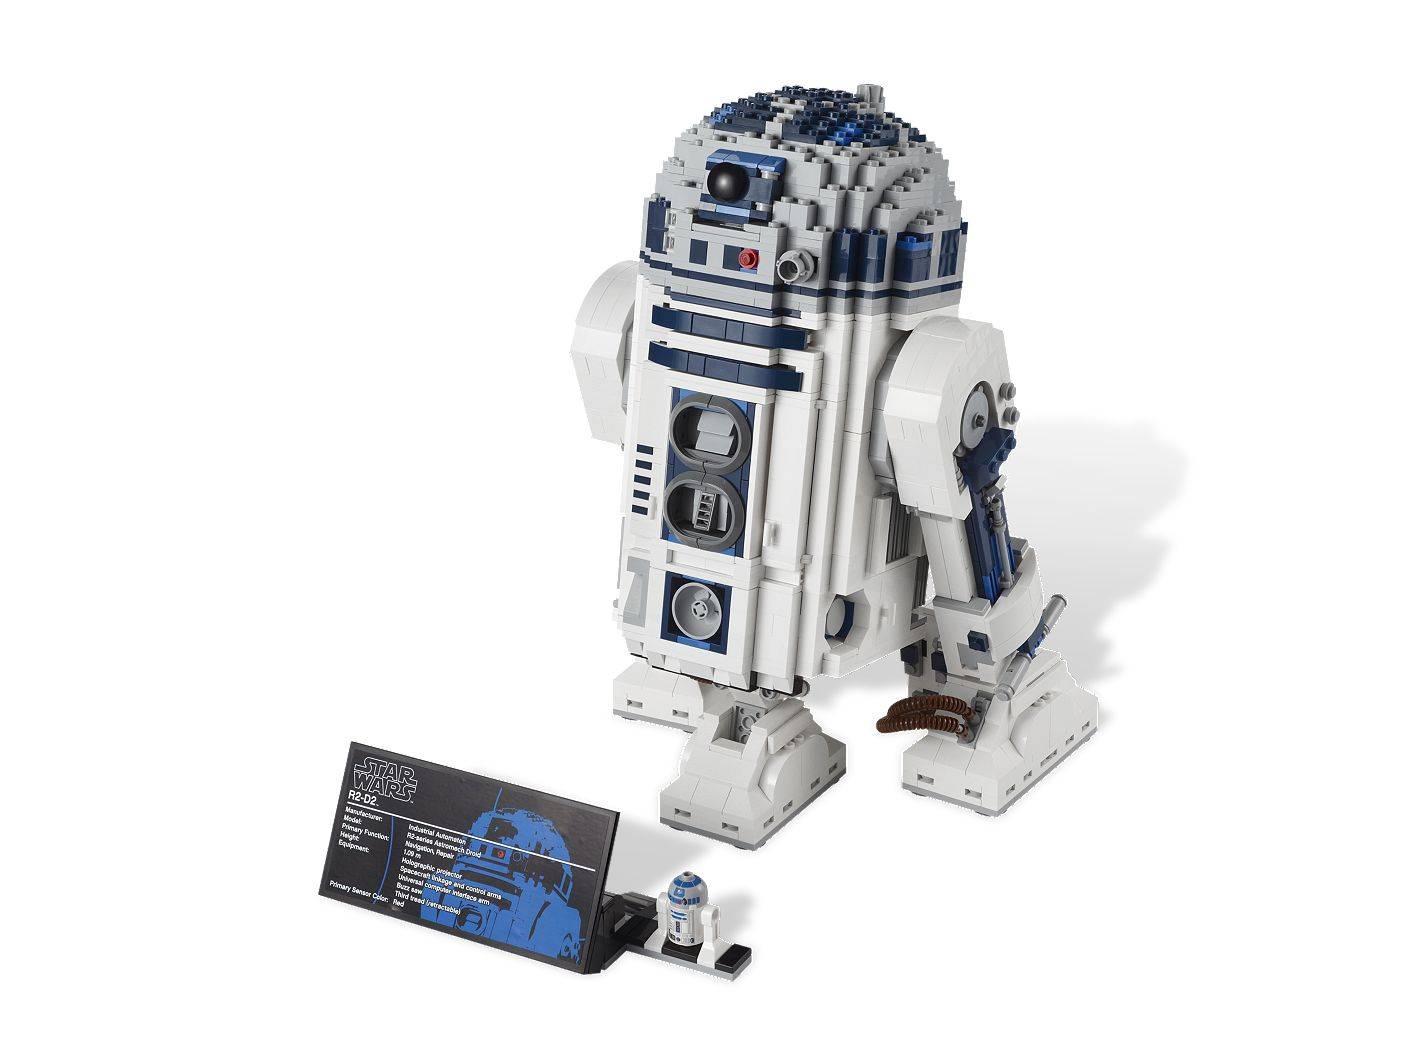 LEGO R2-D2 10225